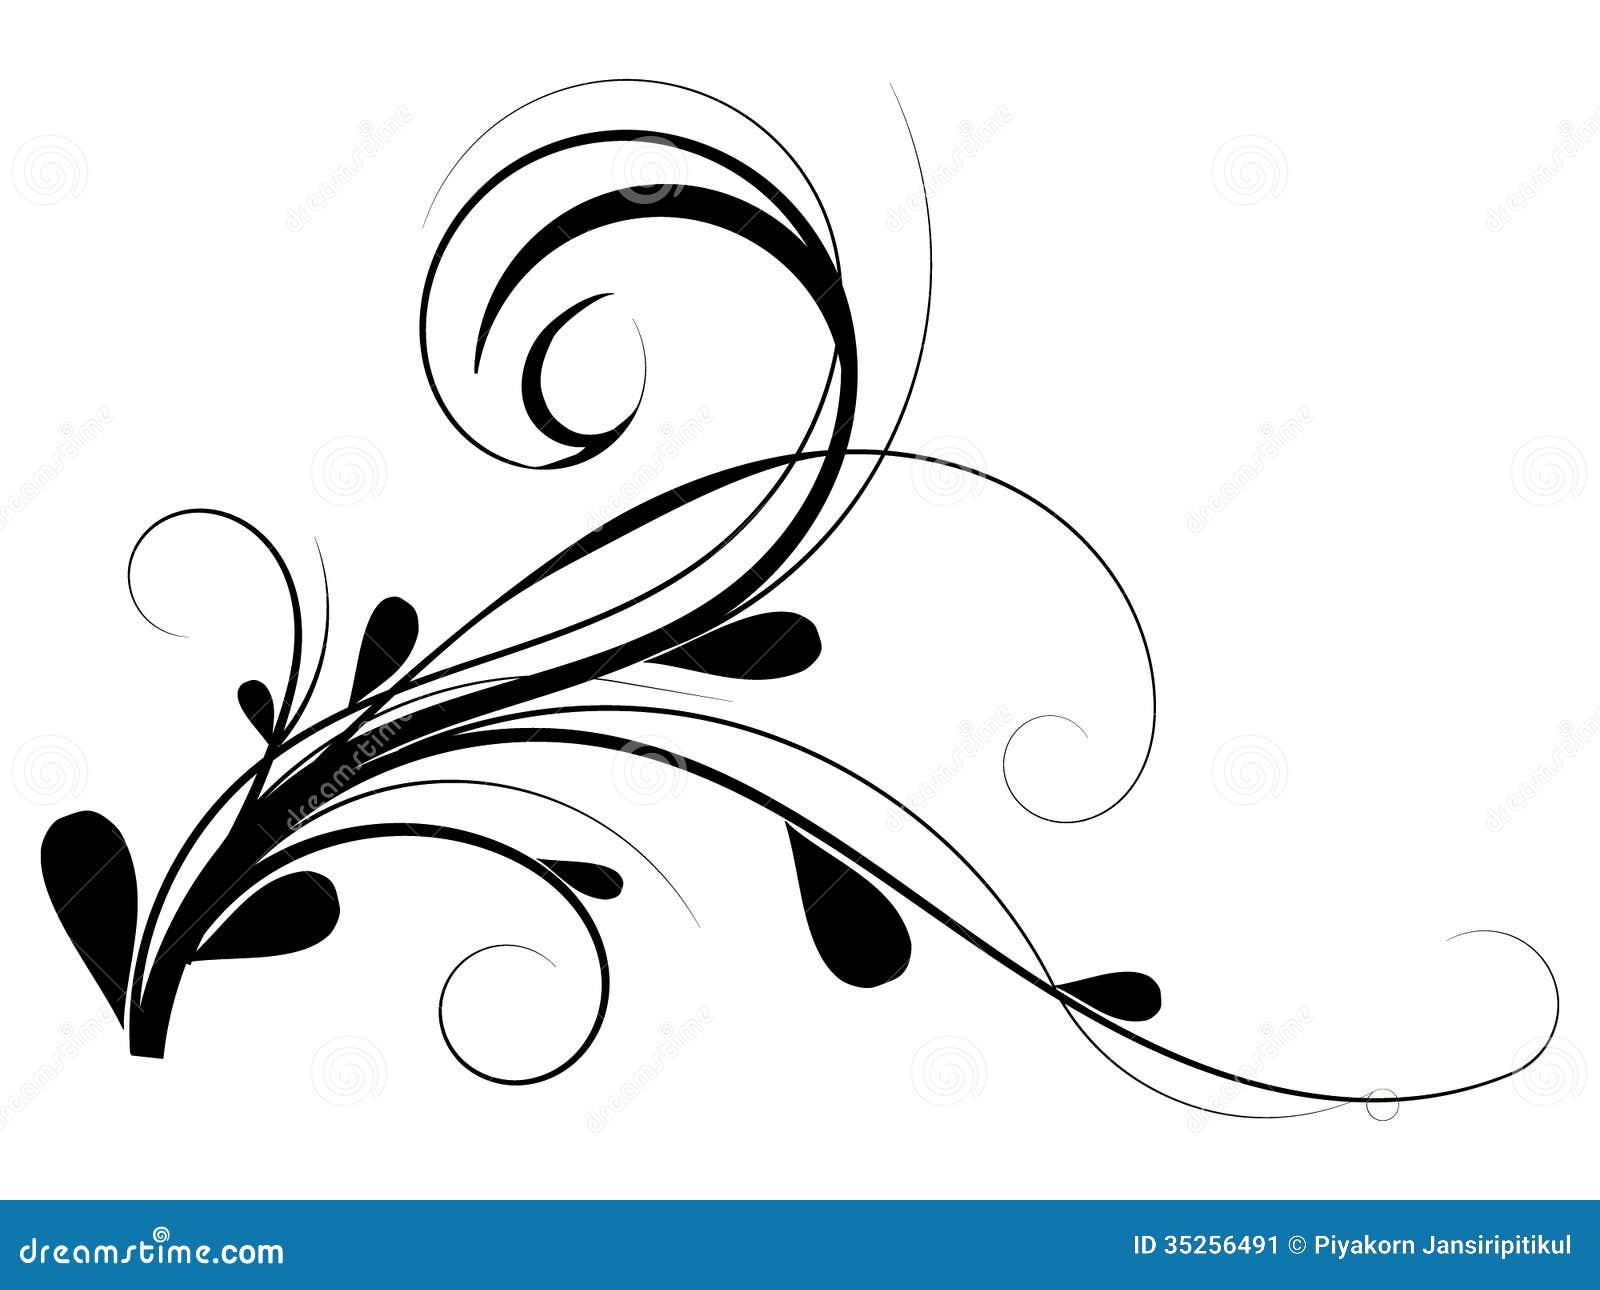 Scroll Design Wedding Invitations with luxury invitations design